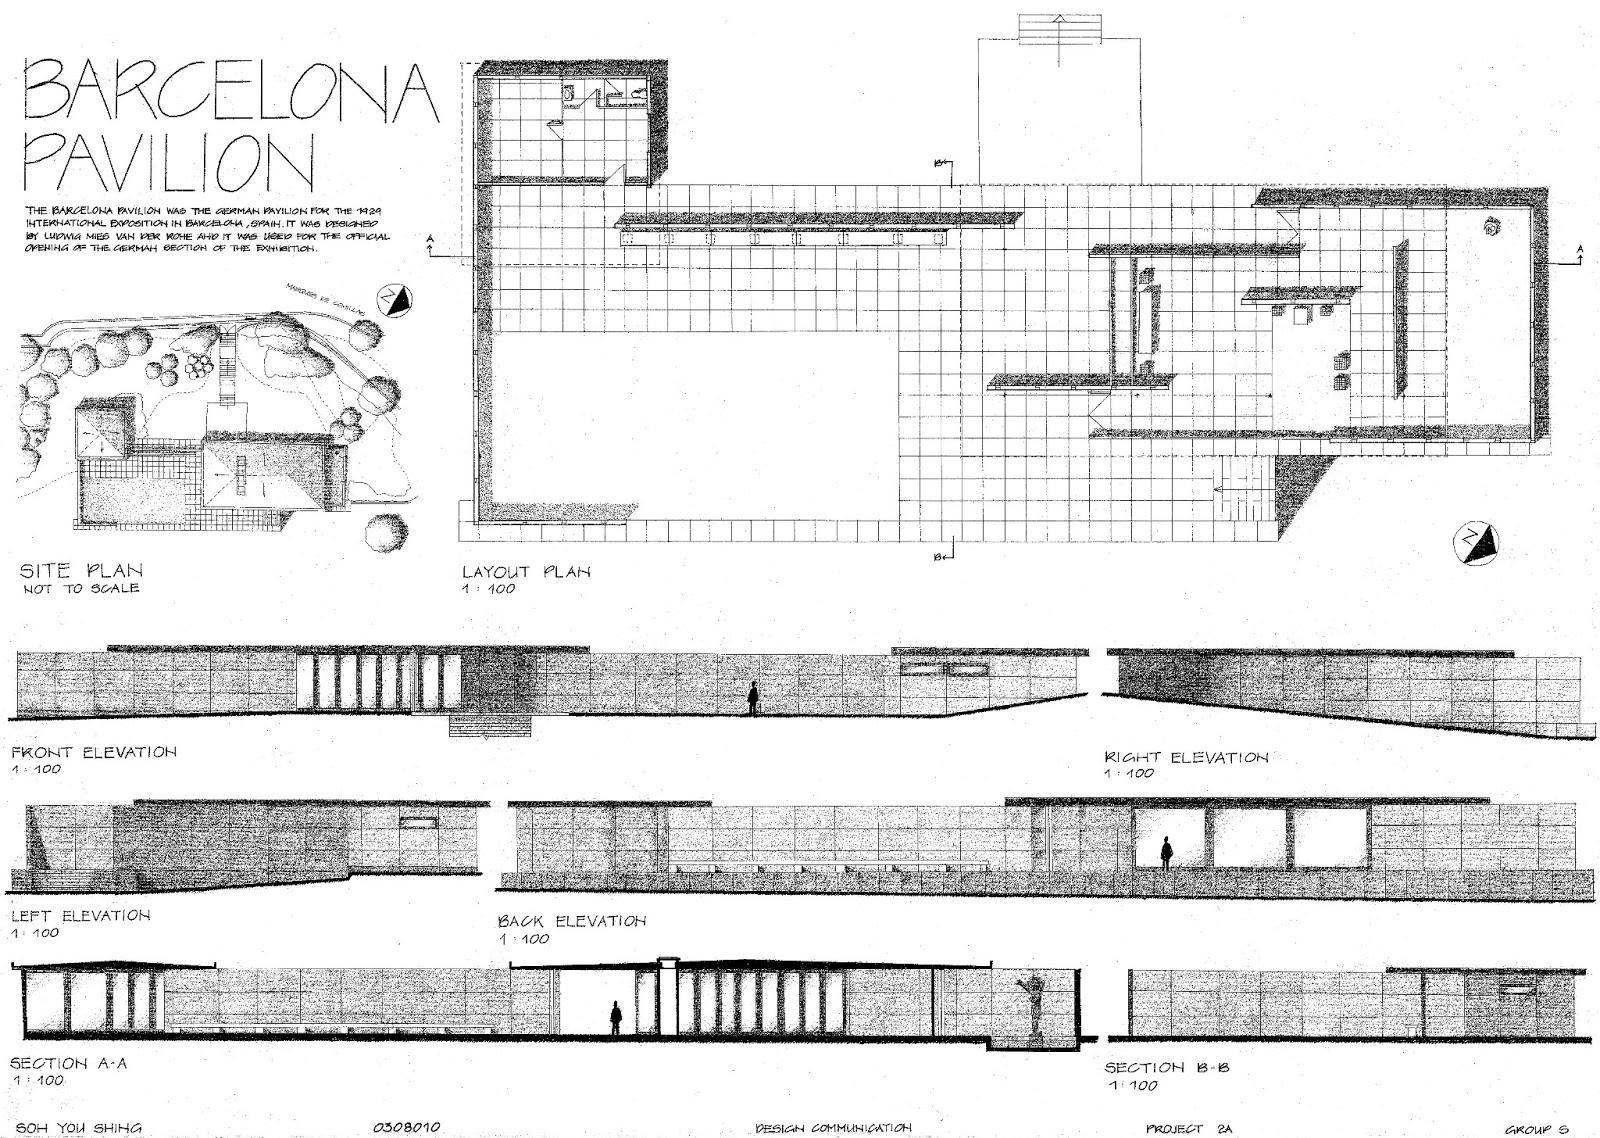 barcelona pavilion floor plan dimensions barcelona pavilion ludwig mies van der rohe emma louise. Black Bedroom Furniture Sets. Home Design Ideas